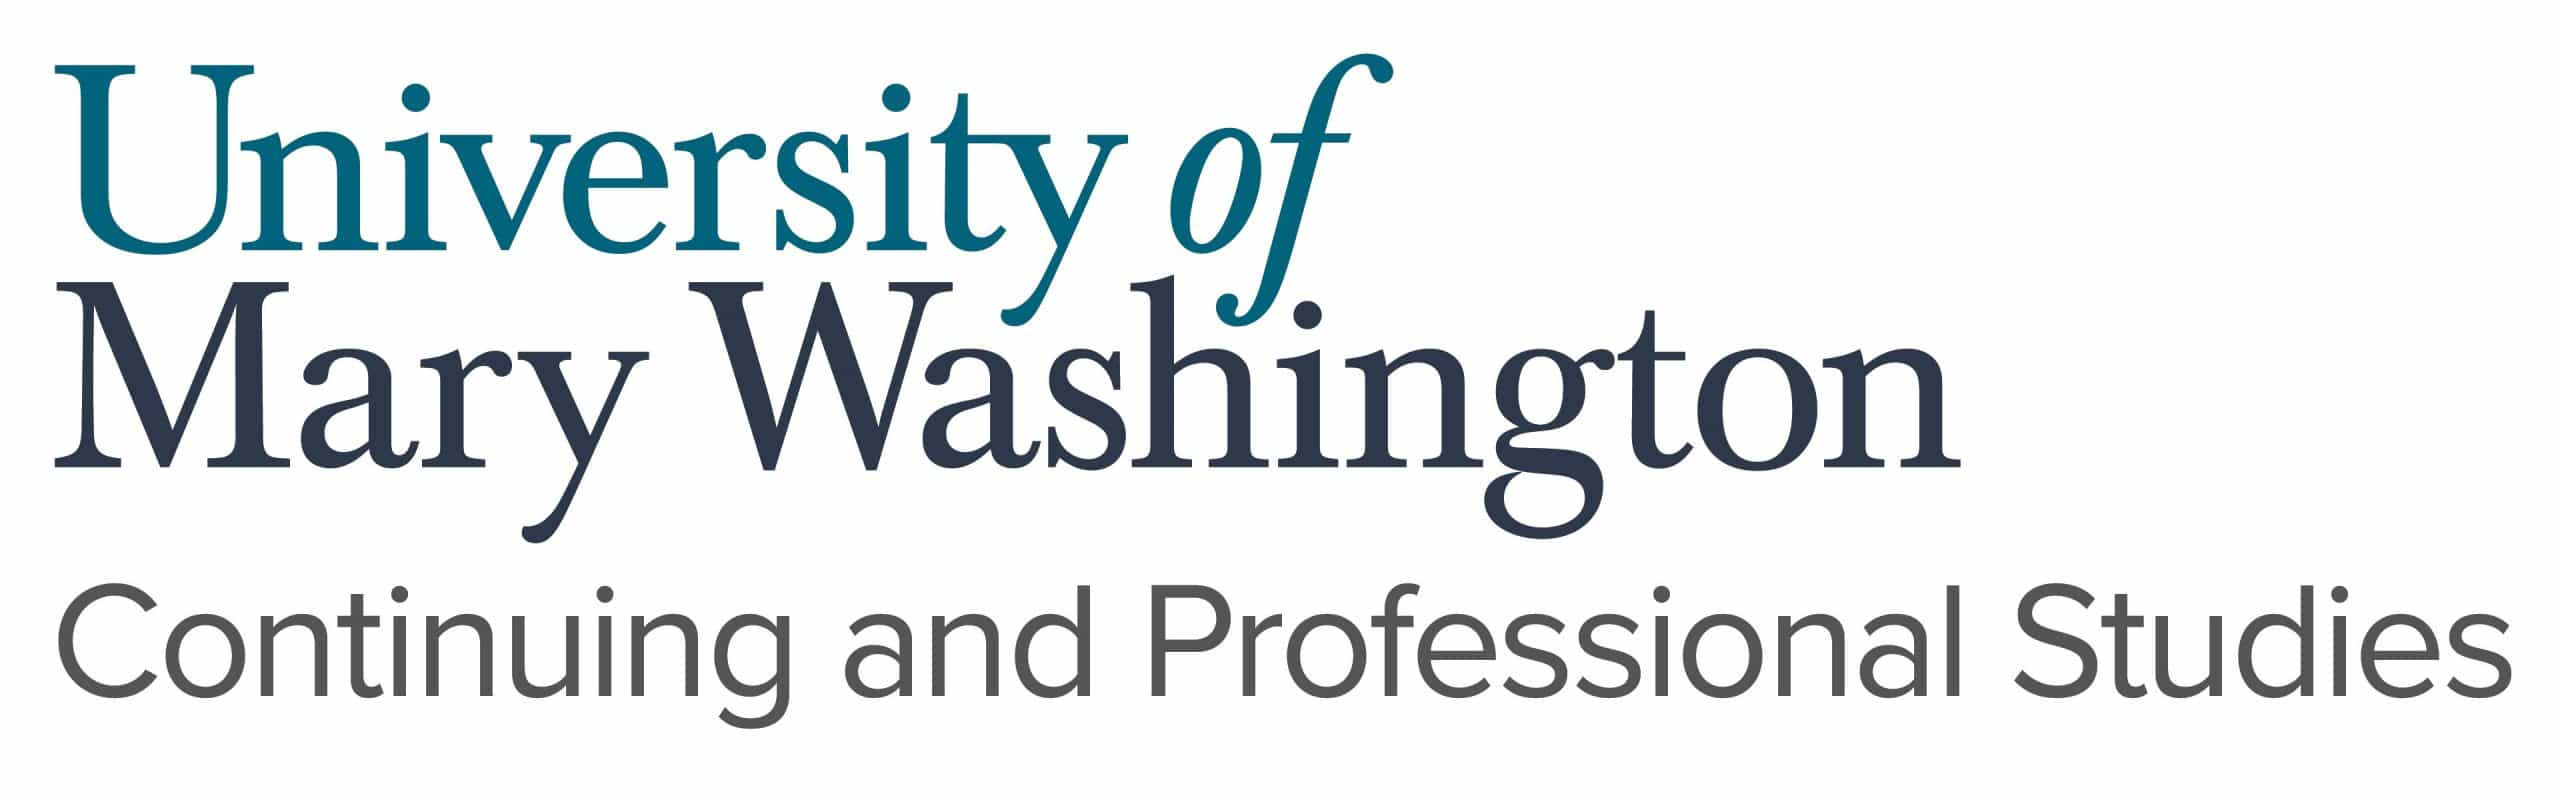 UMW Continuing and Professional Studies